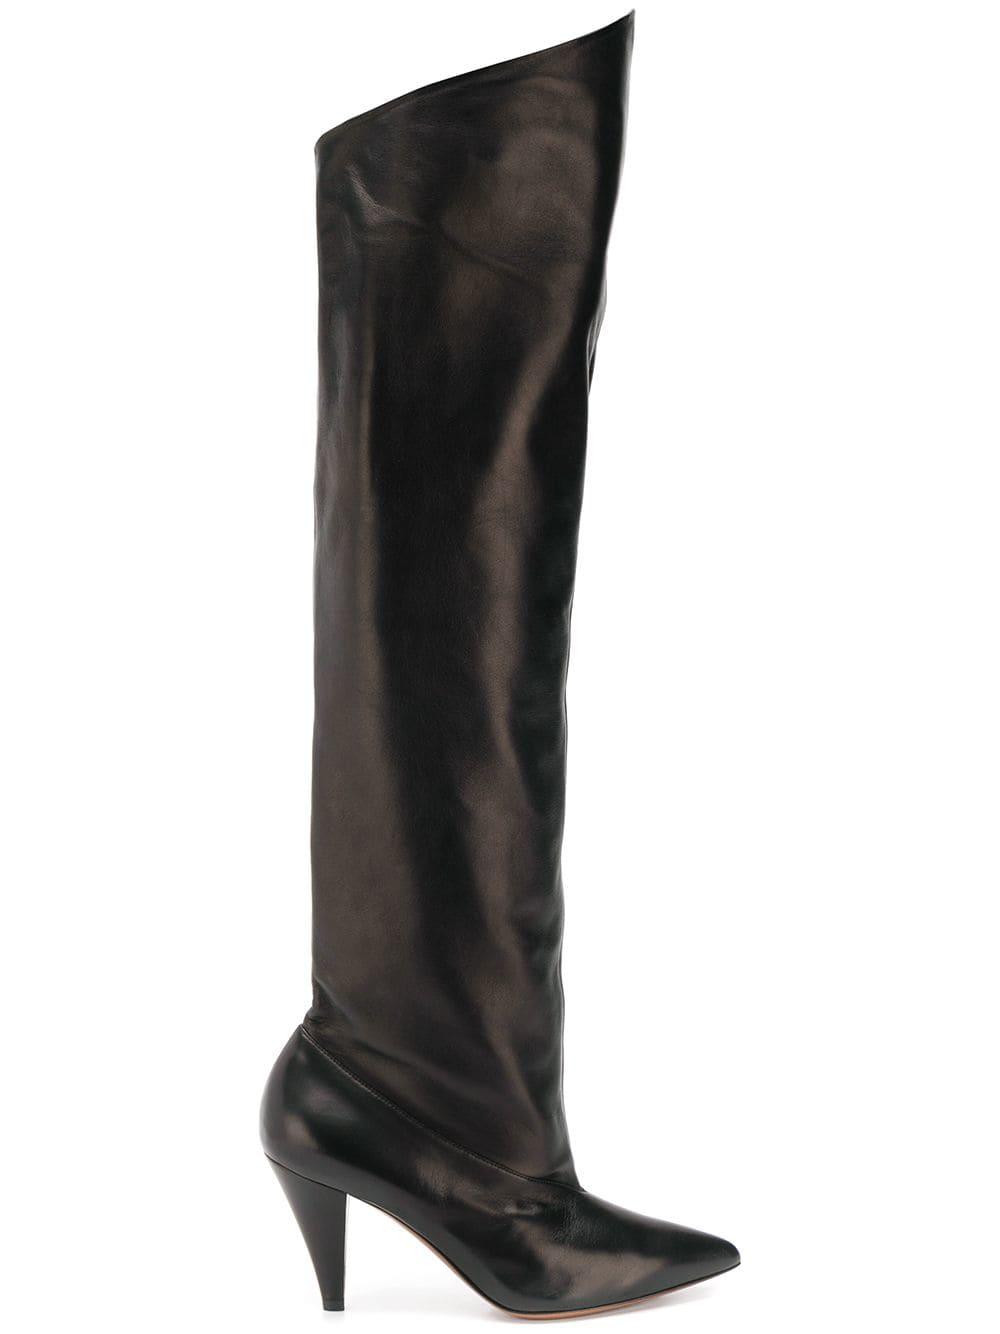 Givenchy Overknee-Stiefel - Schwarz